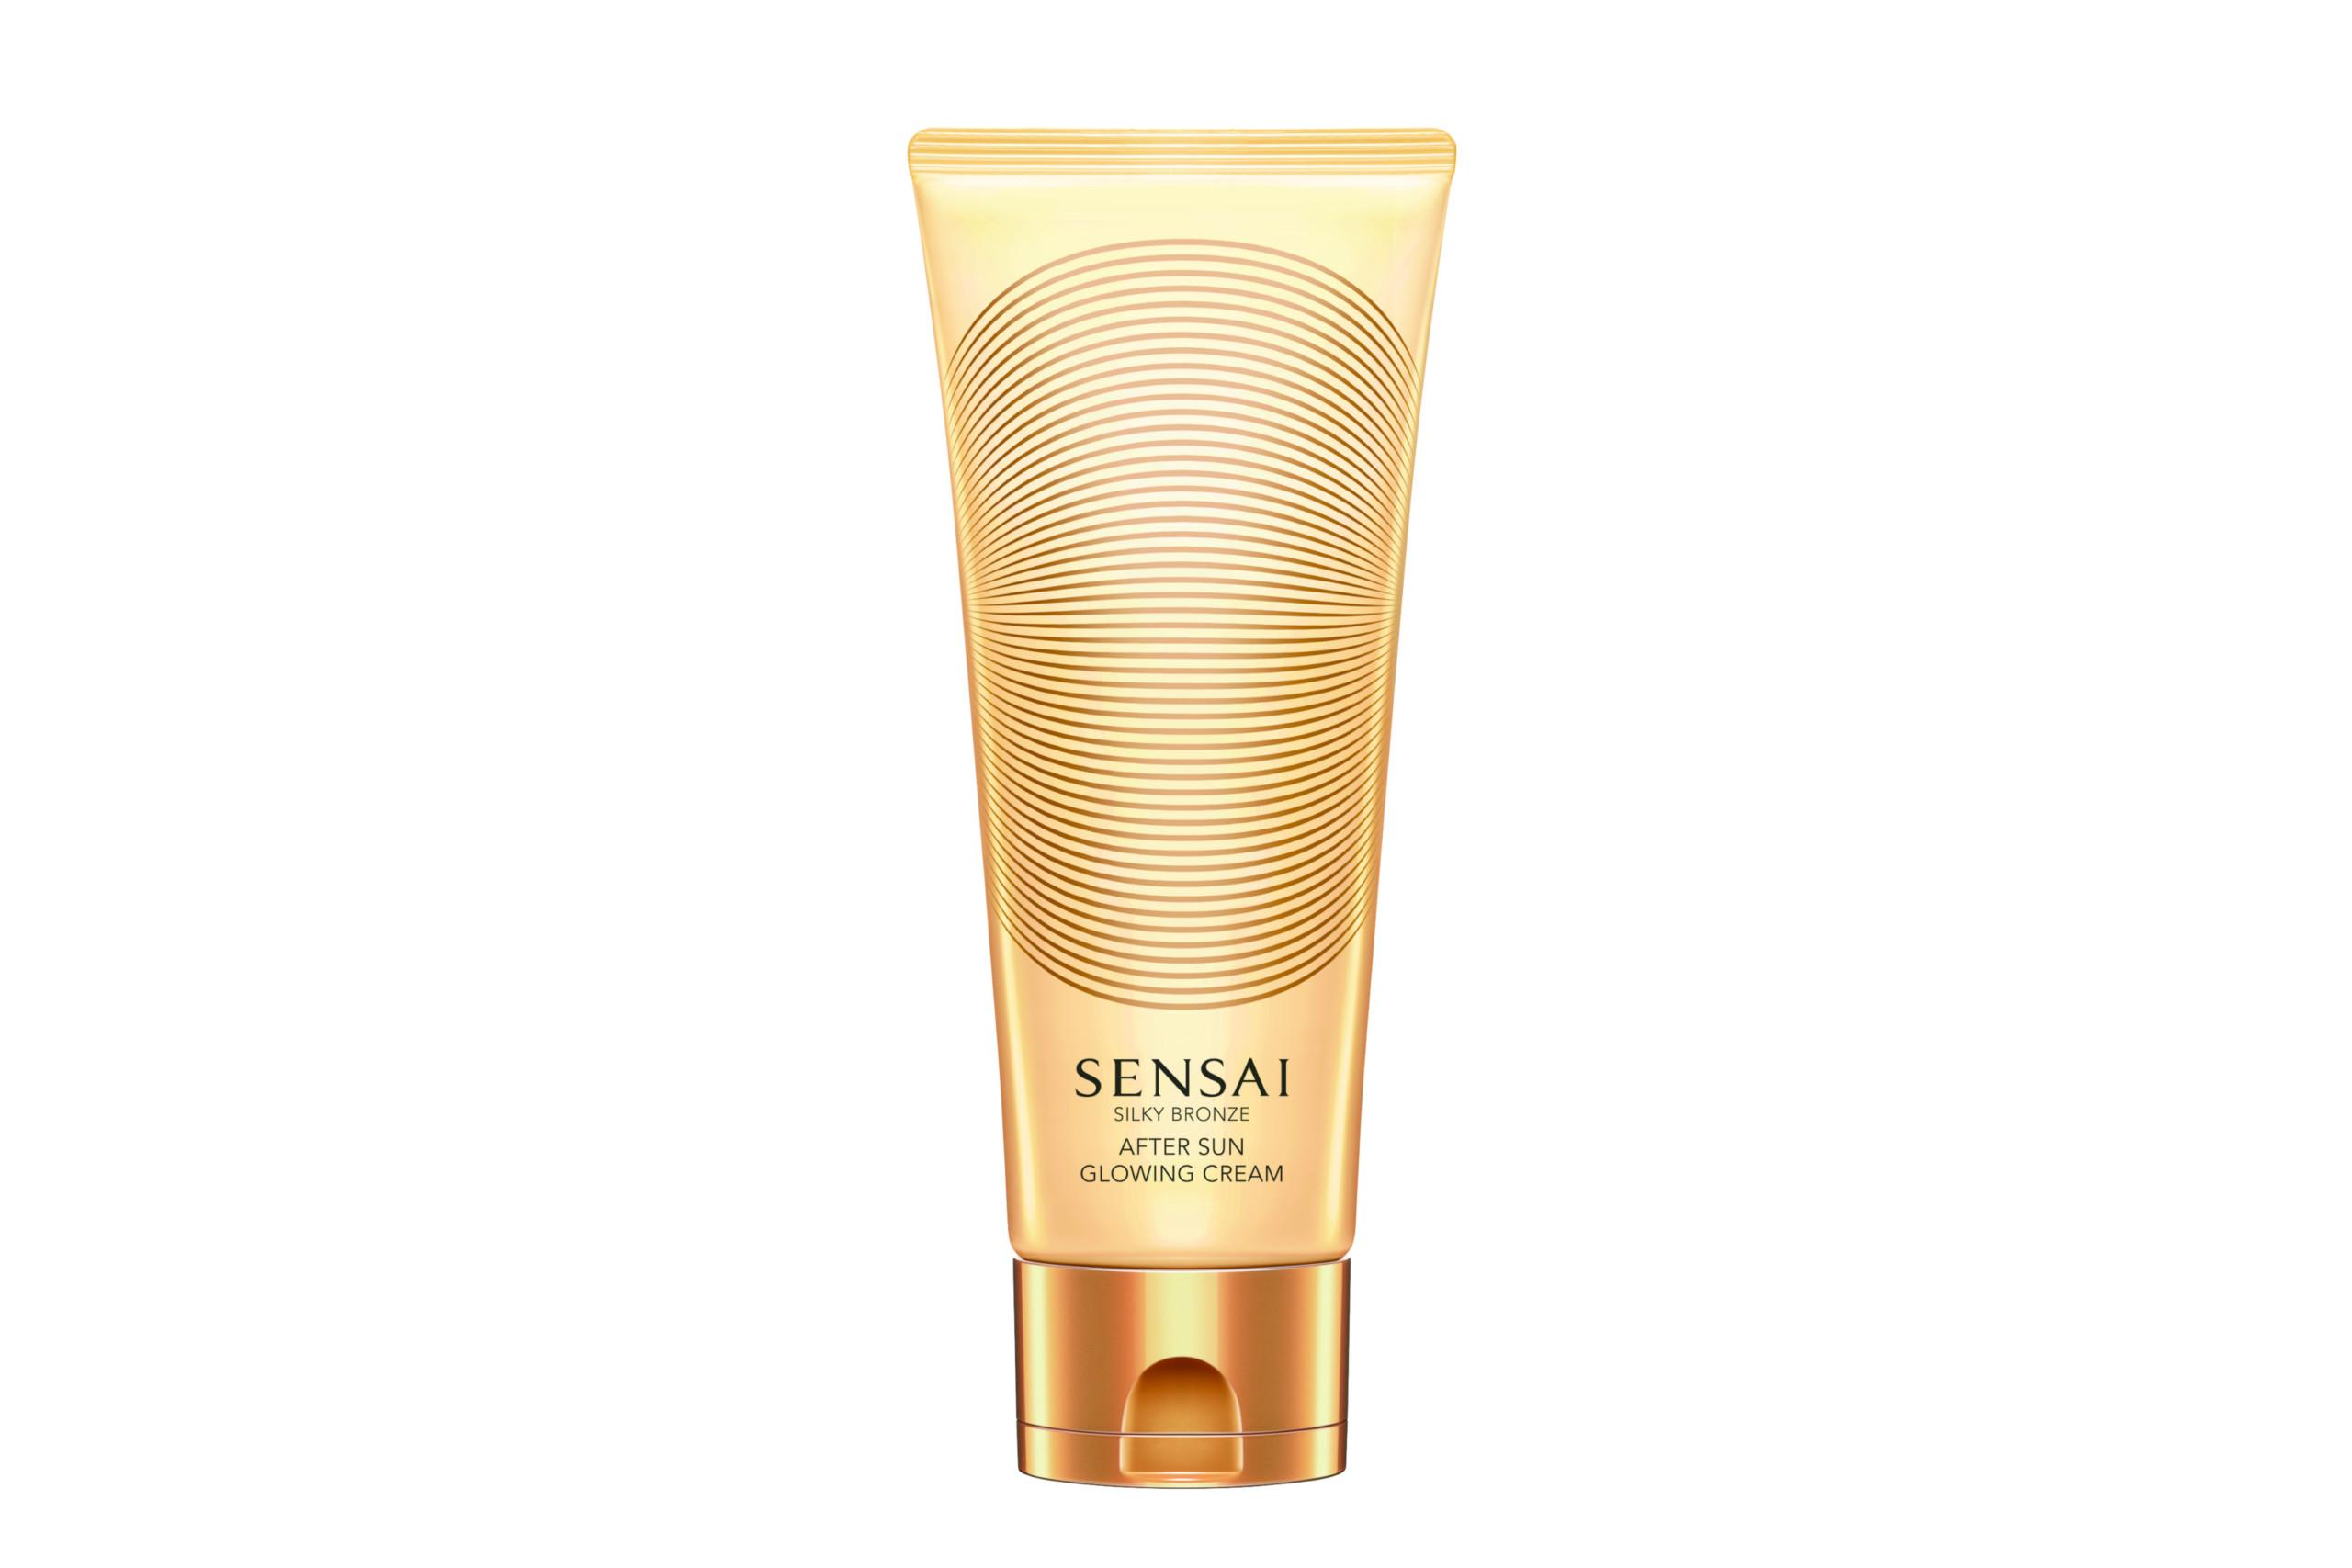 Sensai After Sun Glowing Cream